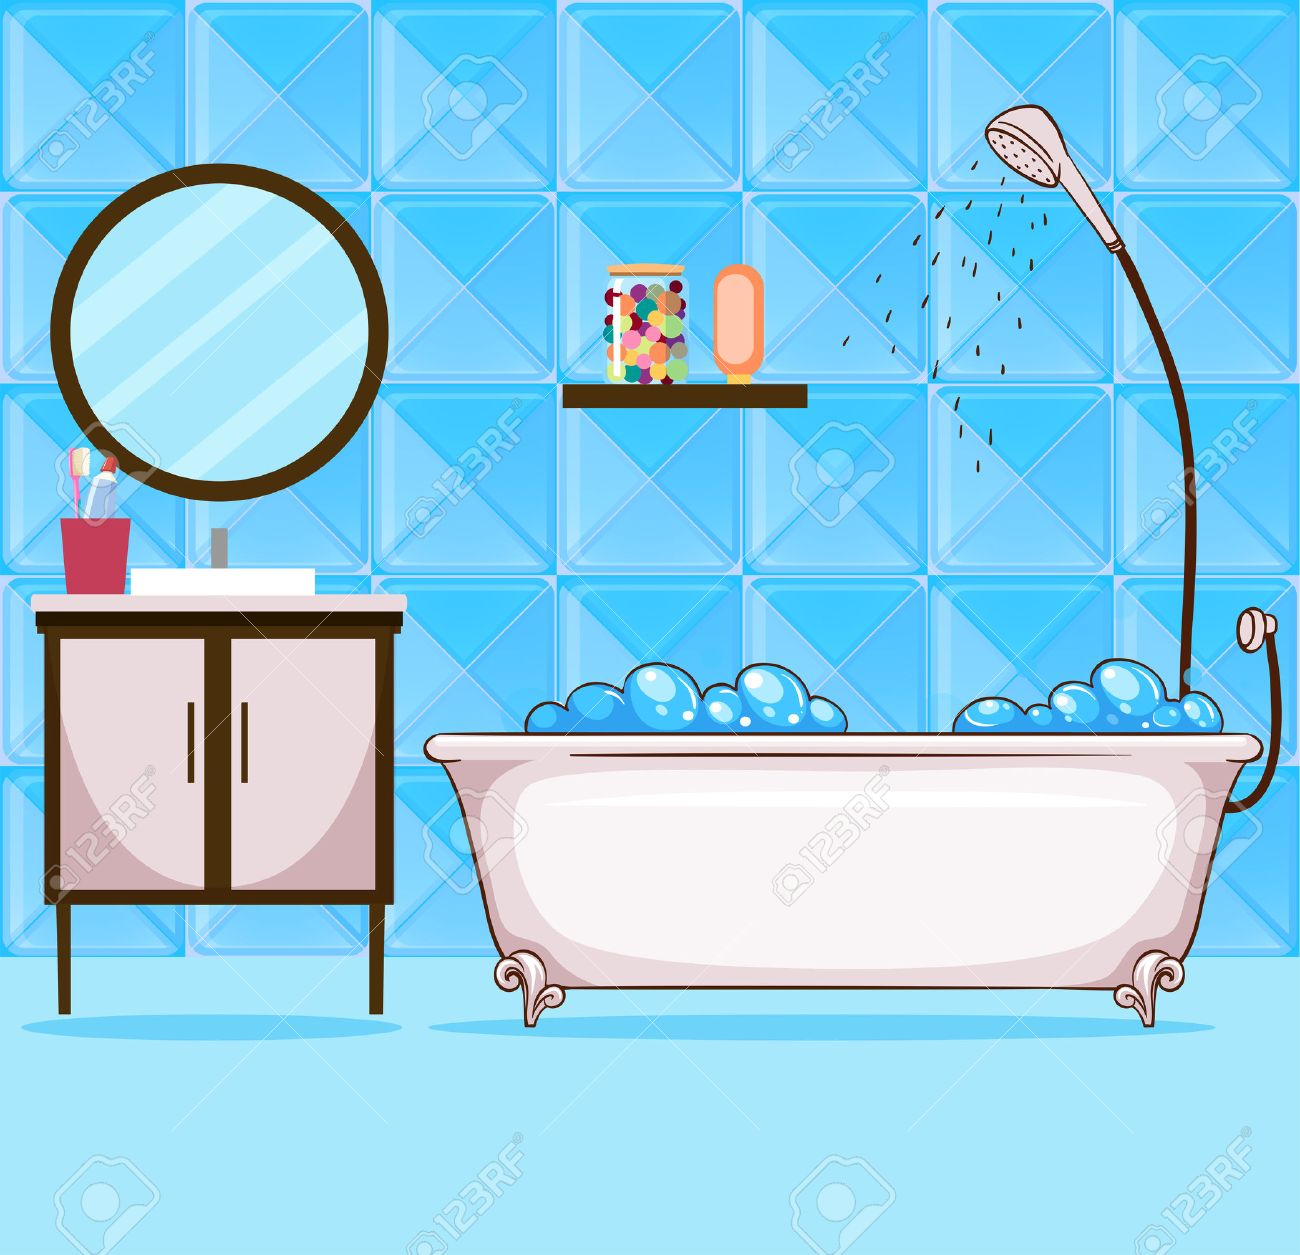 Bathroom with bathtub and shower illustration.